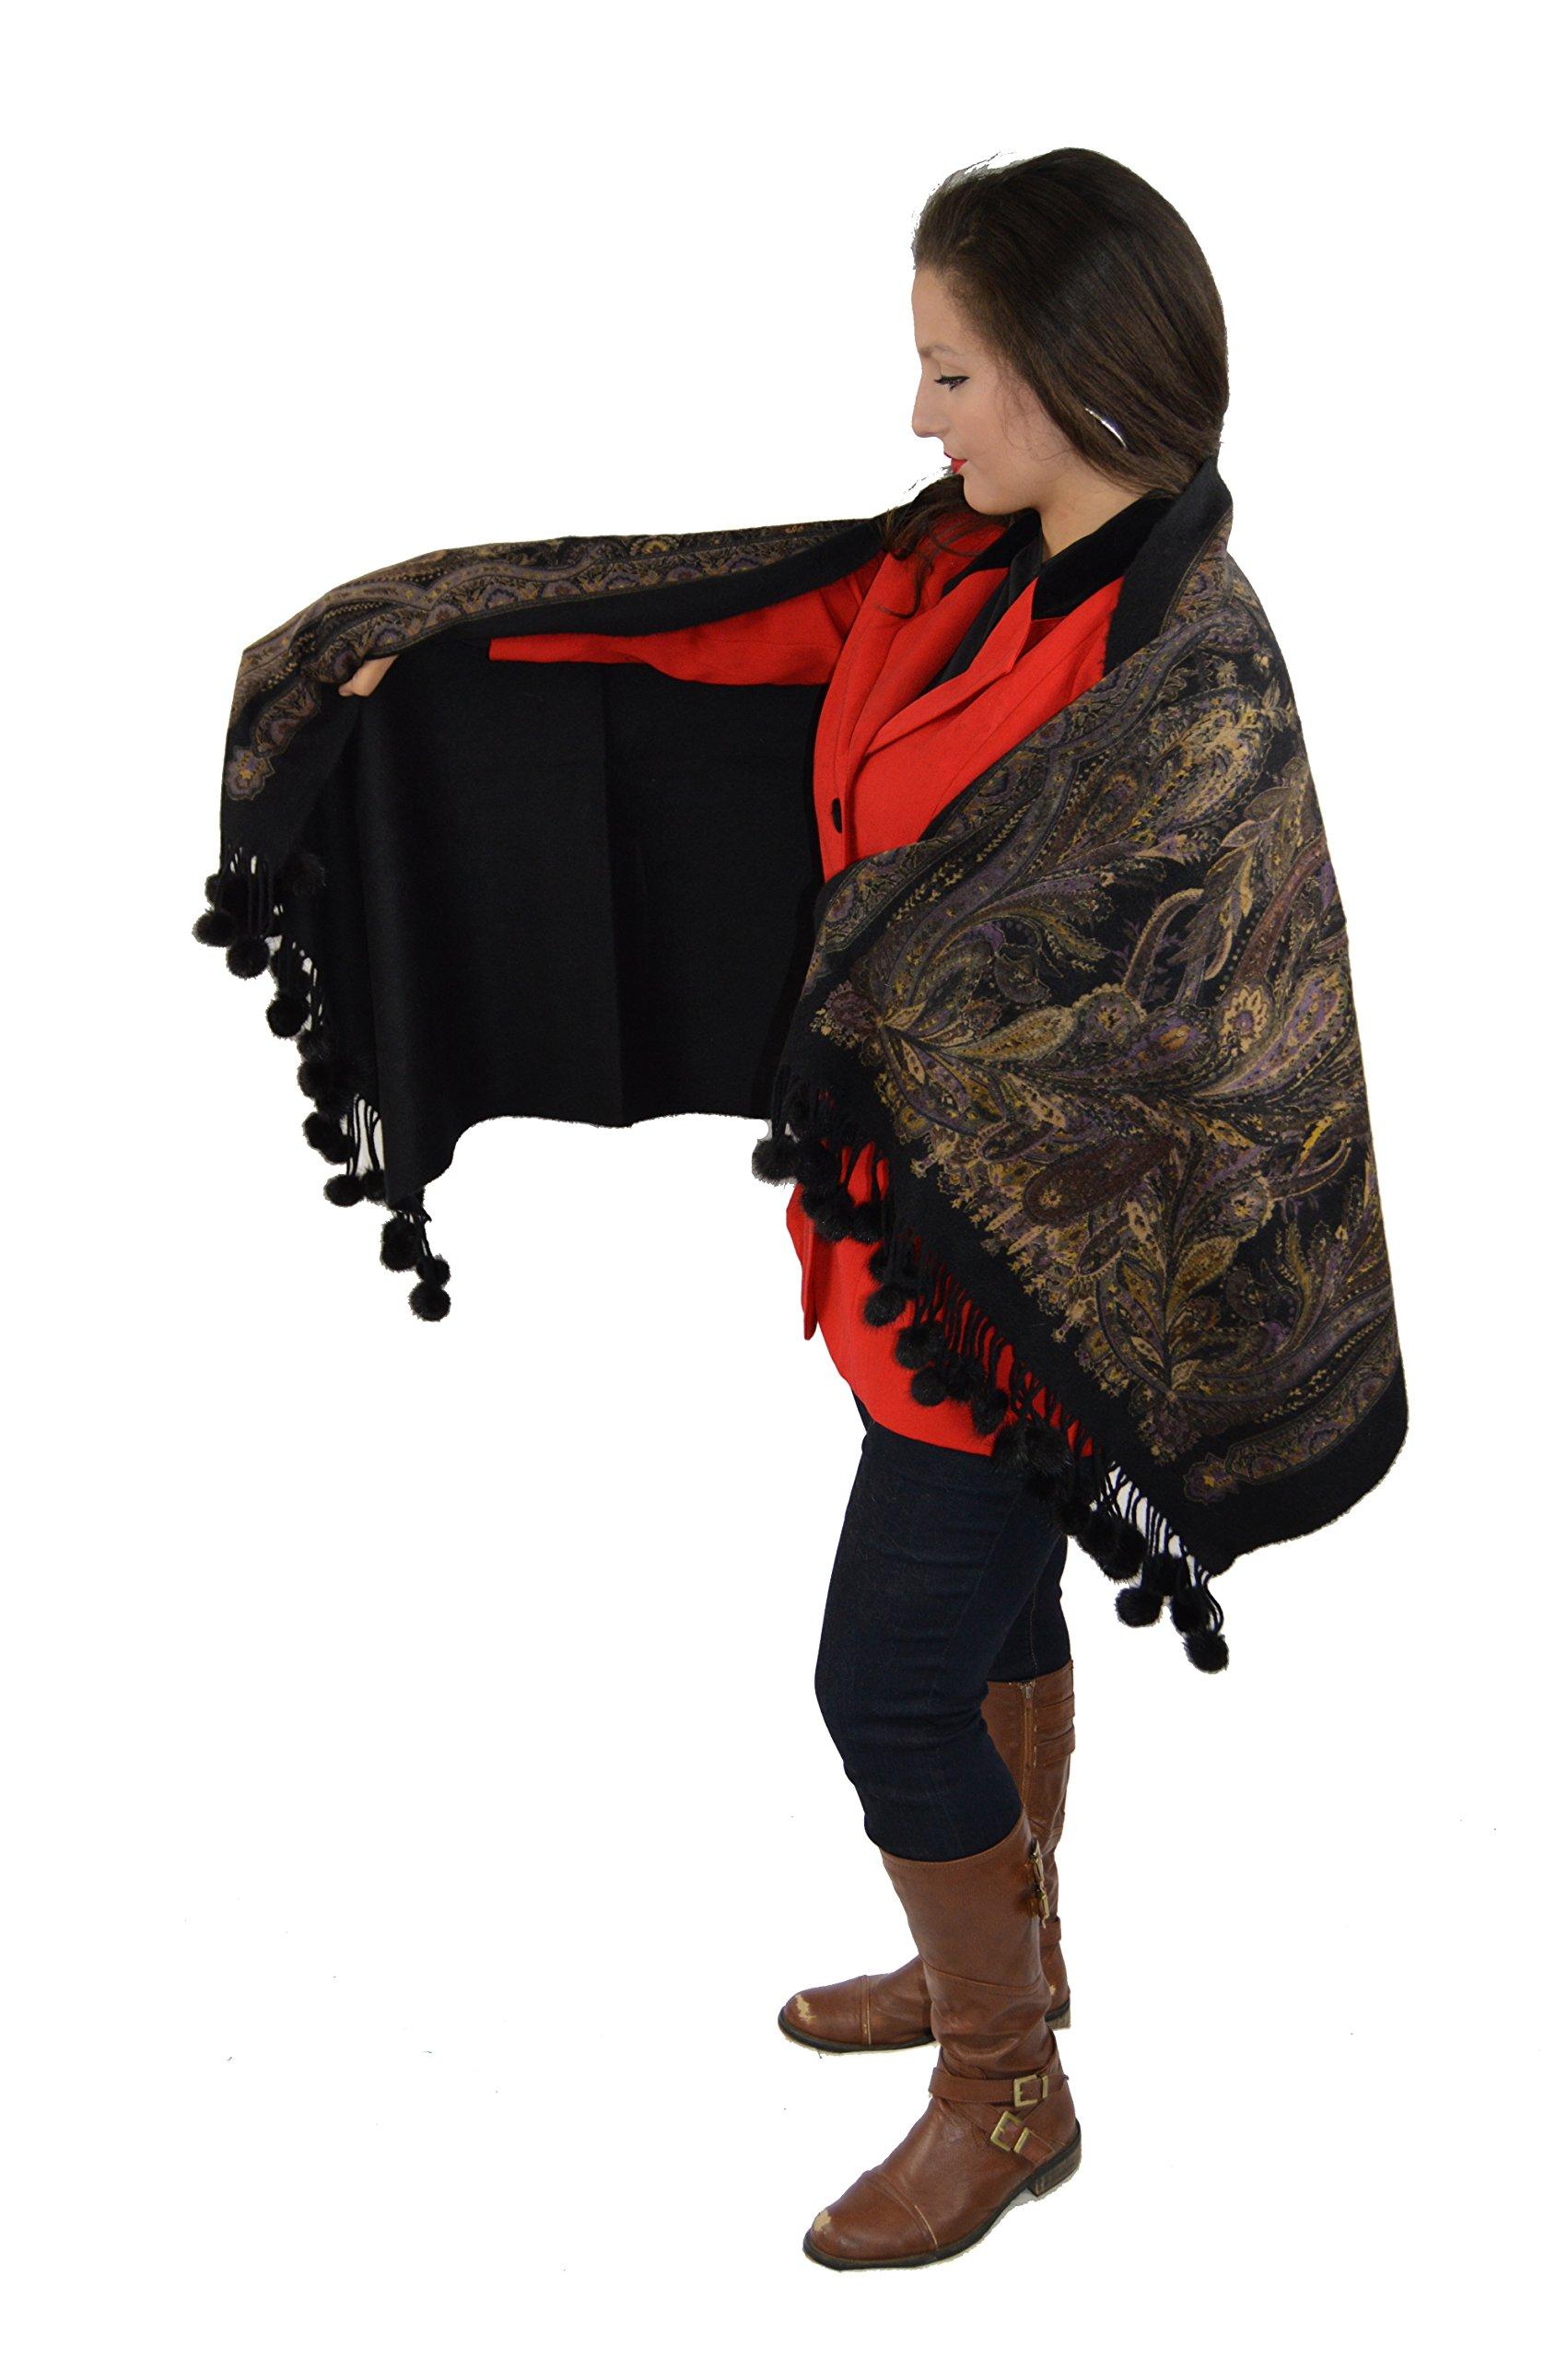 Cashmere Pashmina Group-Cashmere Shawl Scarf Wrap Stole (Solid/ Reversible Print w/ Genuine Fur) - Mink Black by Cashmere Pashmina Group (Image #3)